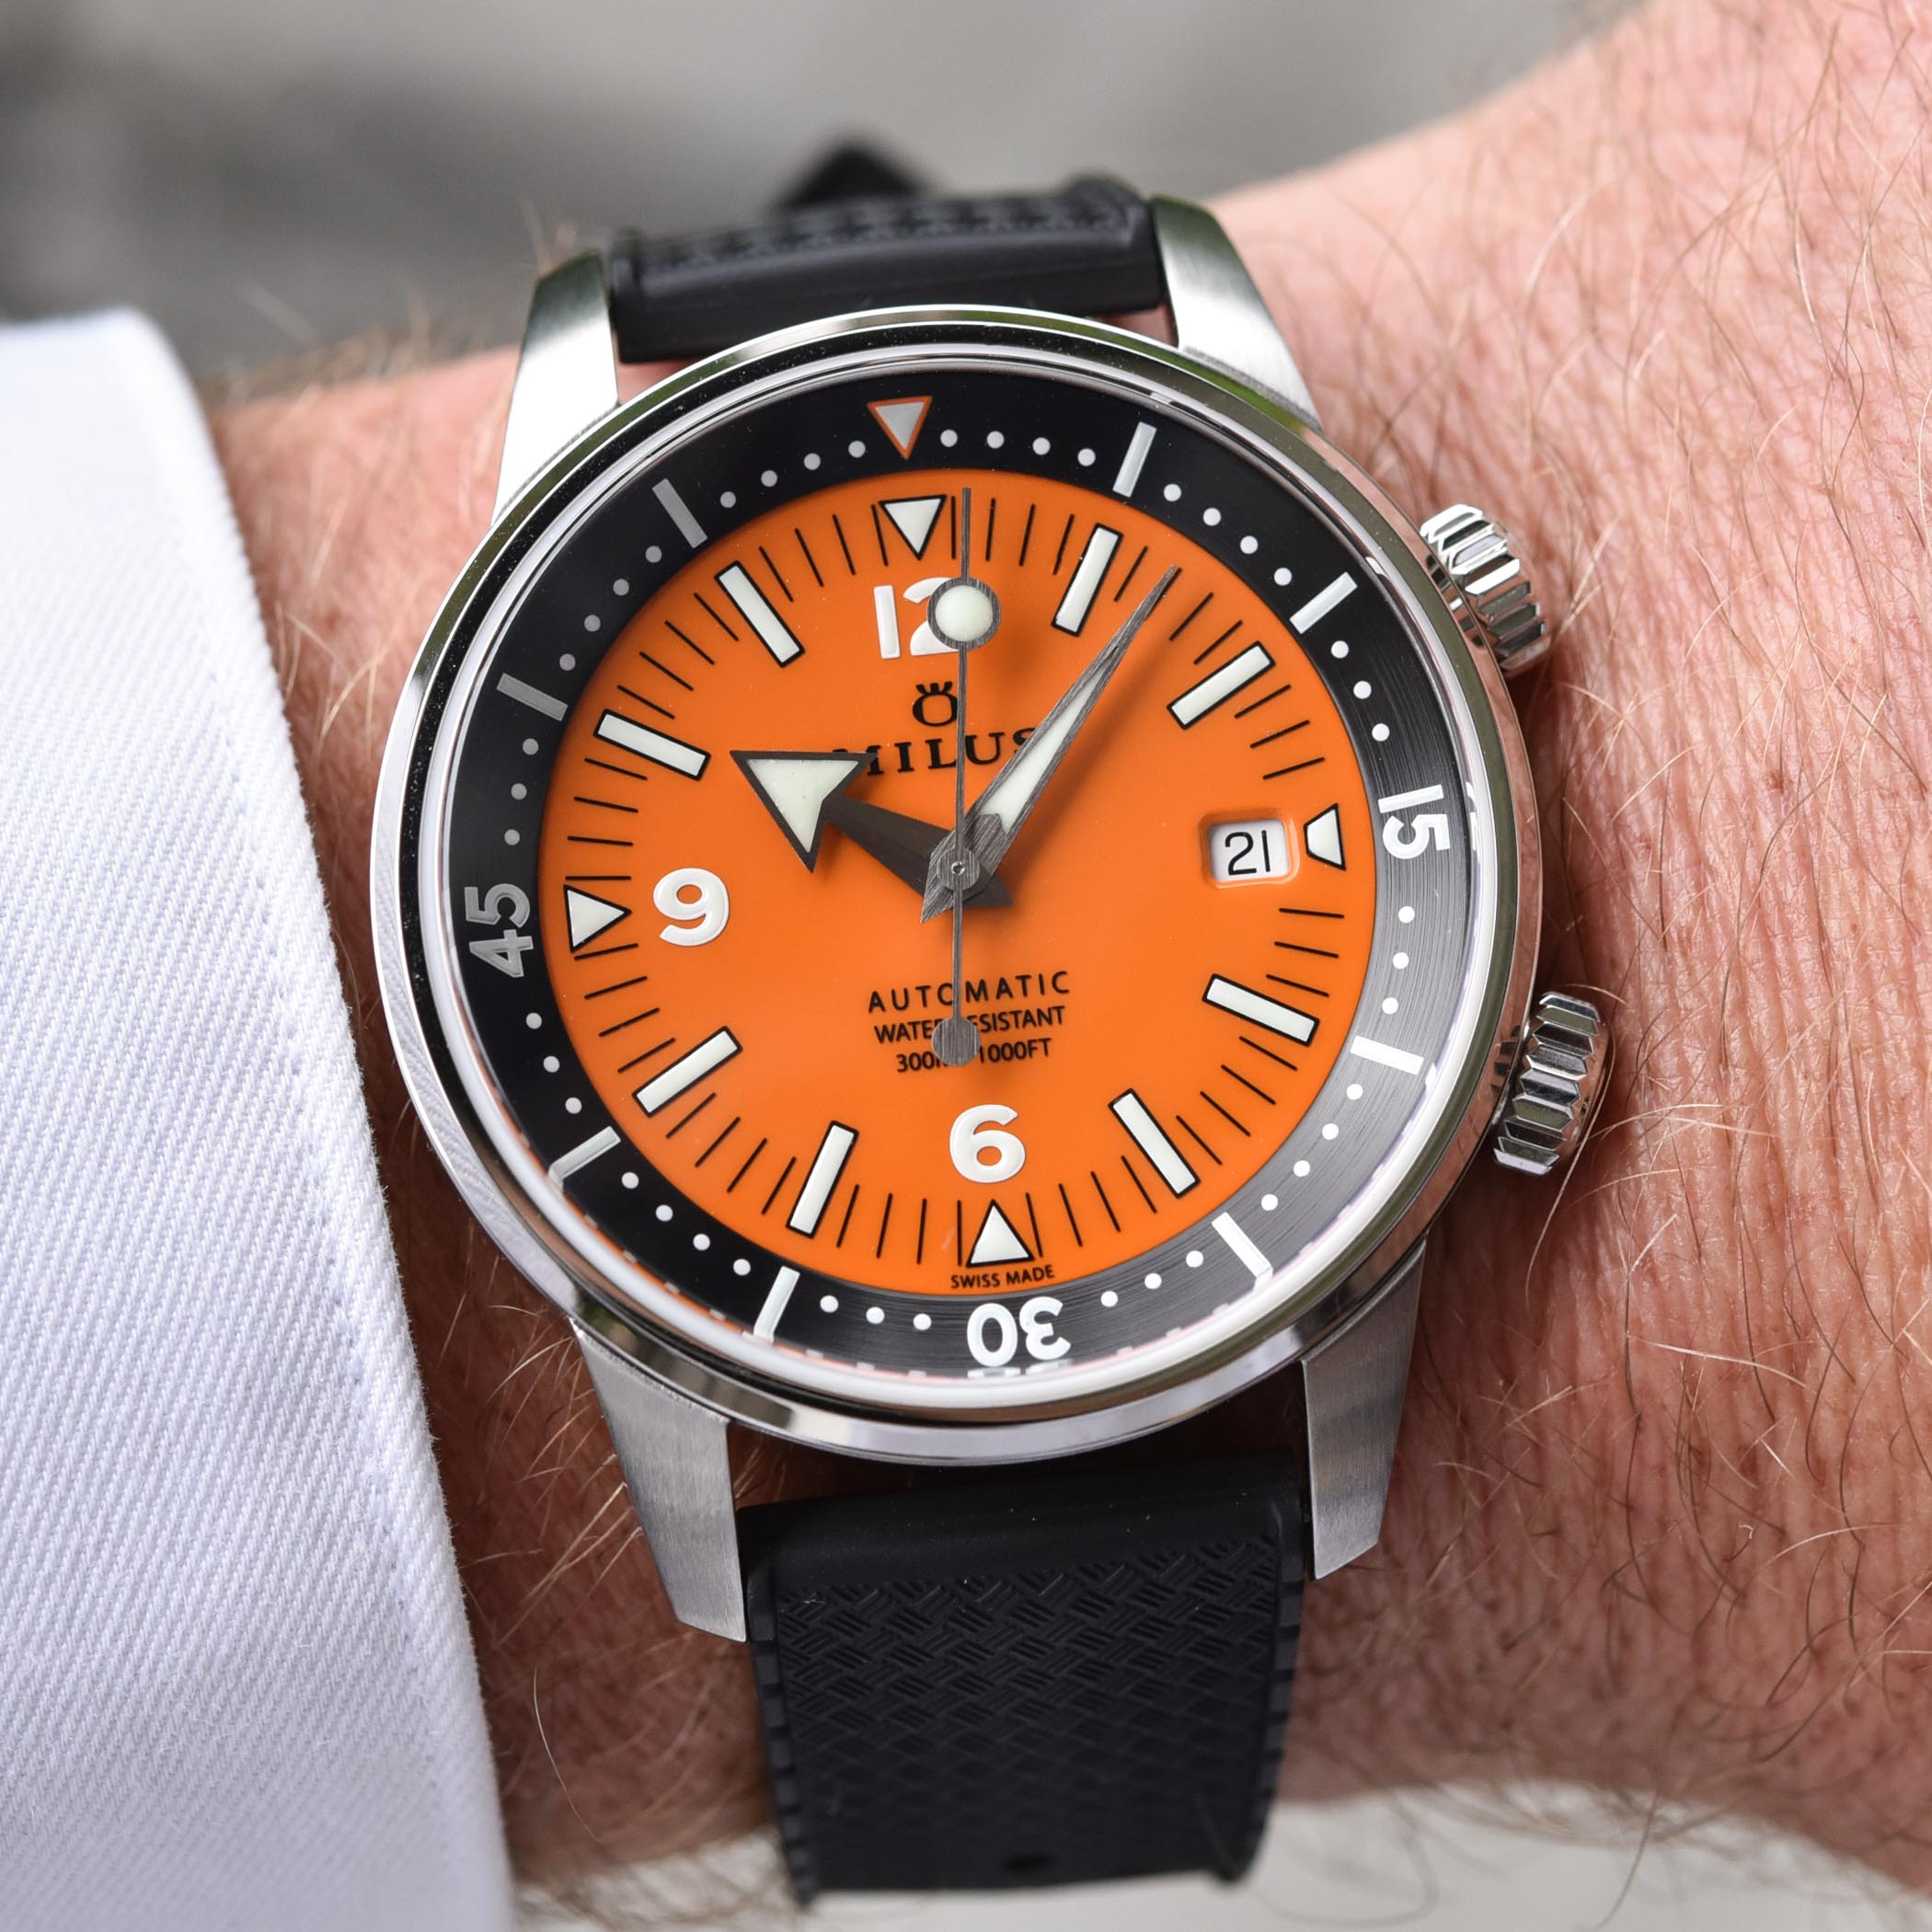 Milus Archimedes Orange Coral edition - super-compressor dive watch - 4